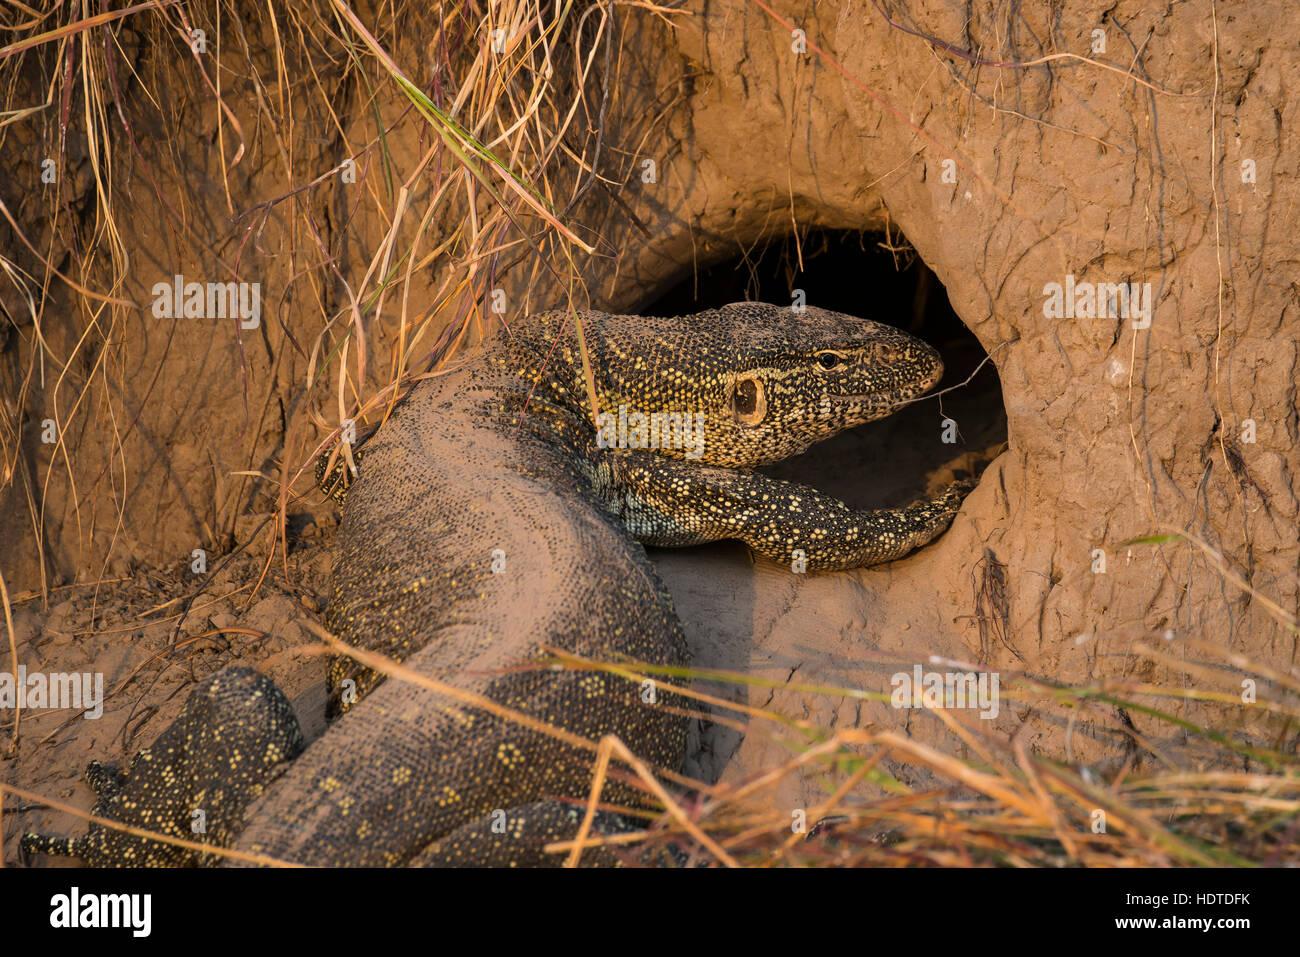 Moniteur du Nil (Varanus niloticus) en face du trou de la termitière, Chobe National Park, Botswana Photo Stock